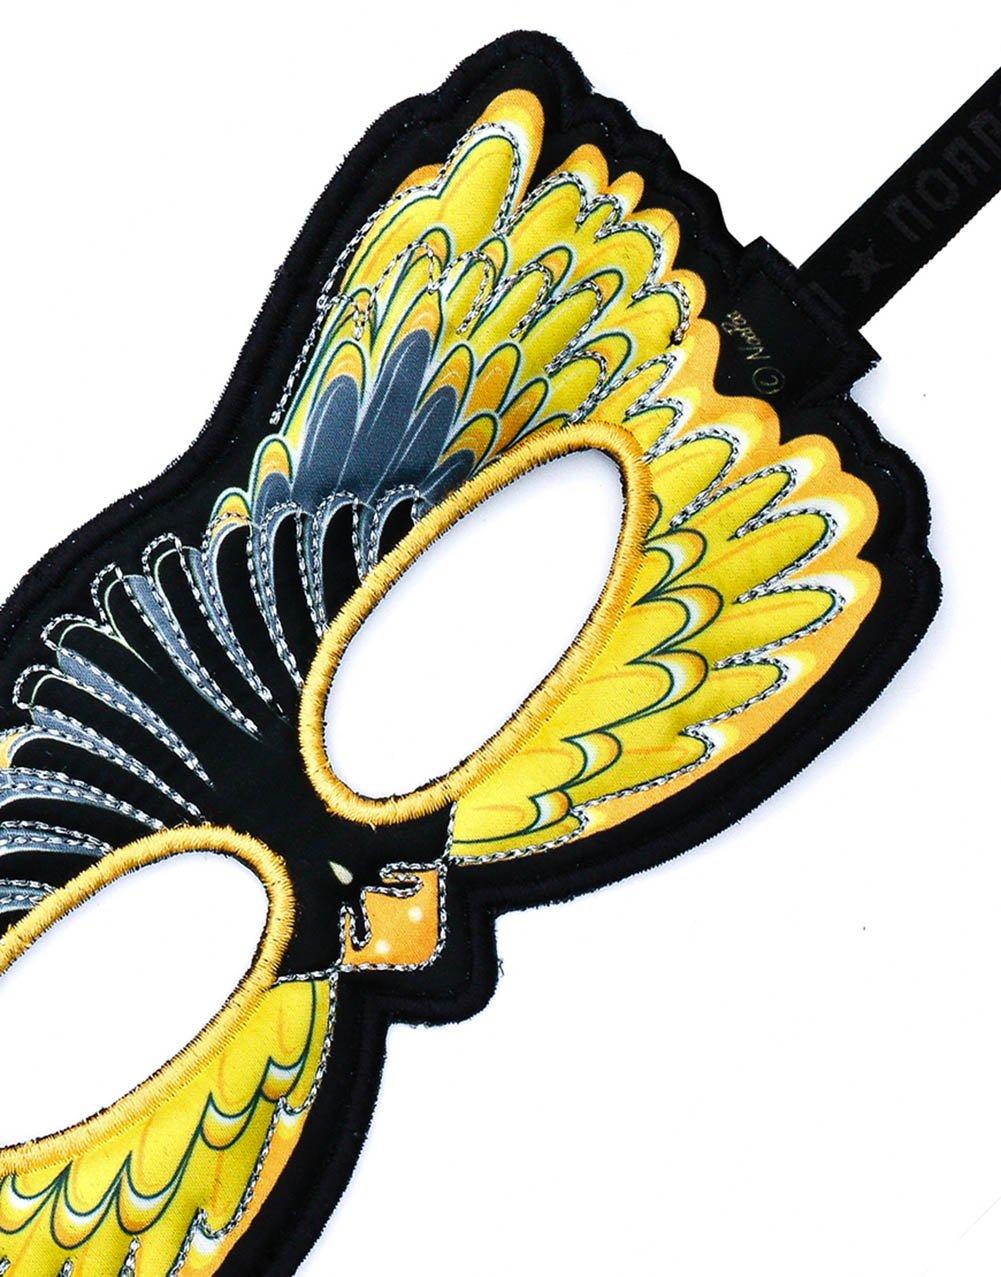 Taille Unique Bird Masque Spinus Tristis DREAMY DRESS-UPS 170/530,5/cm Eastern chardonneret